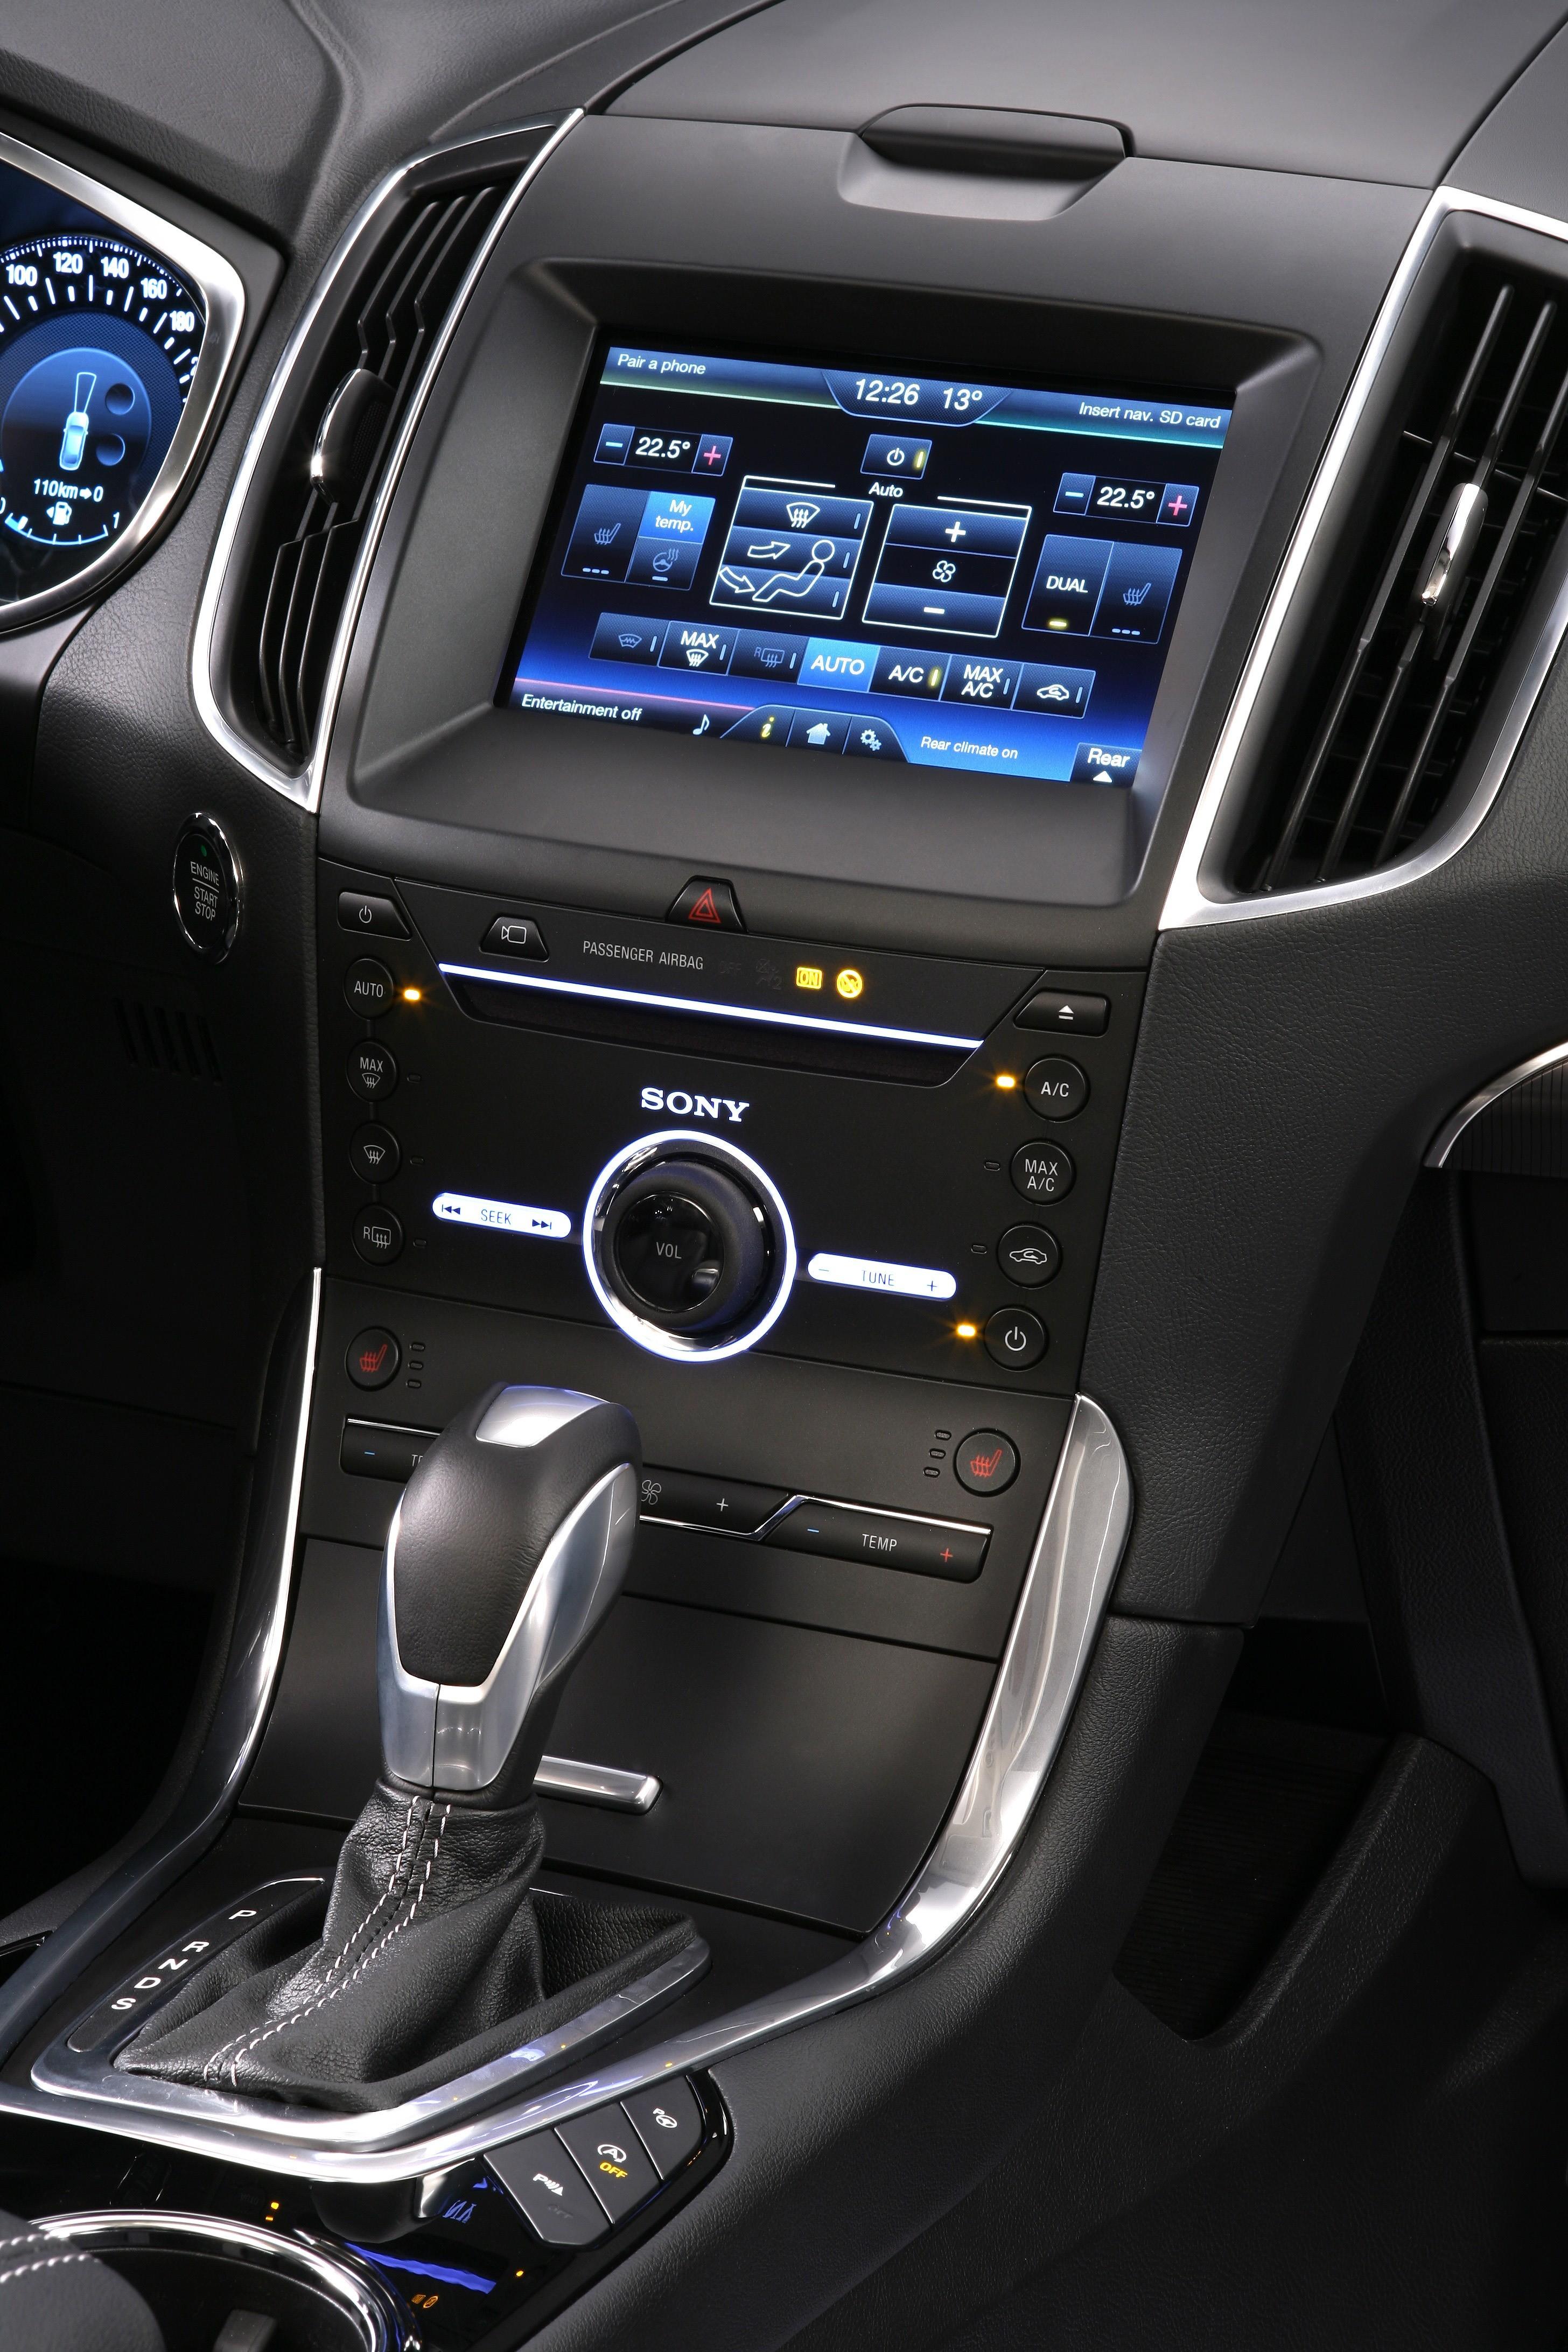 2016 Ford Galaxy Revealed Rides On Cd4 Platform